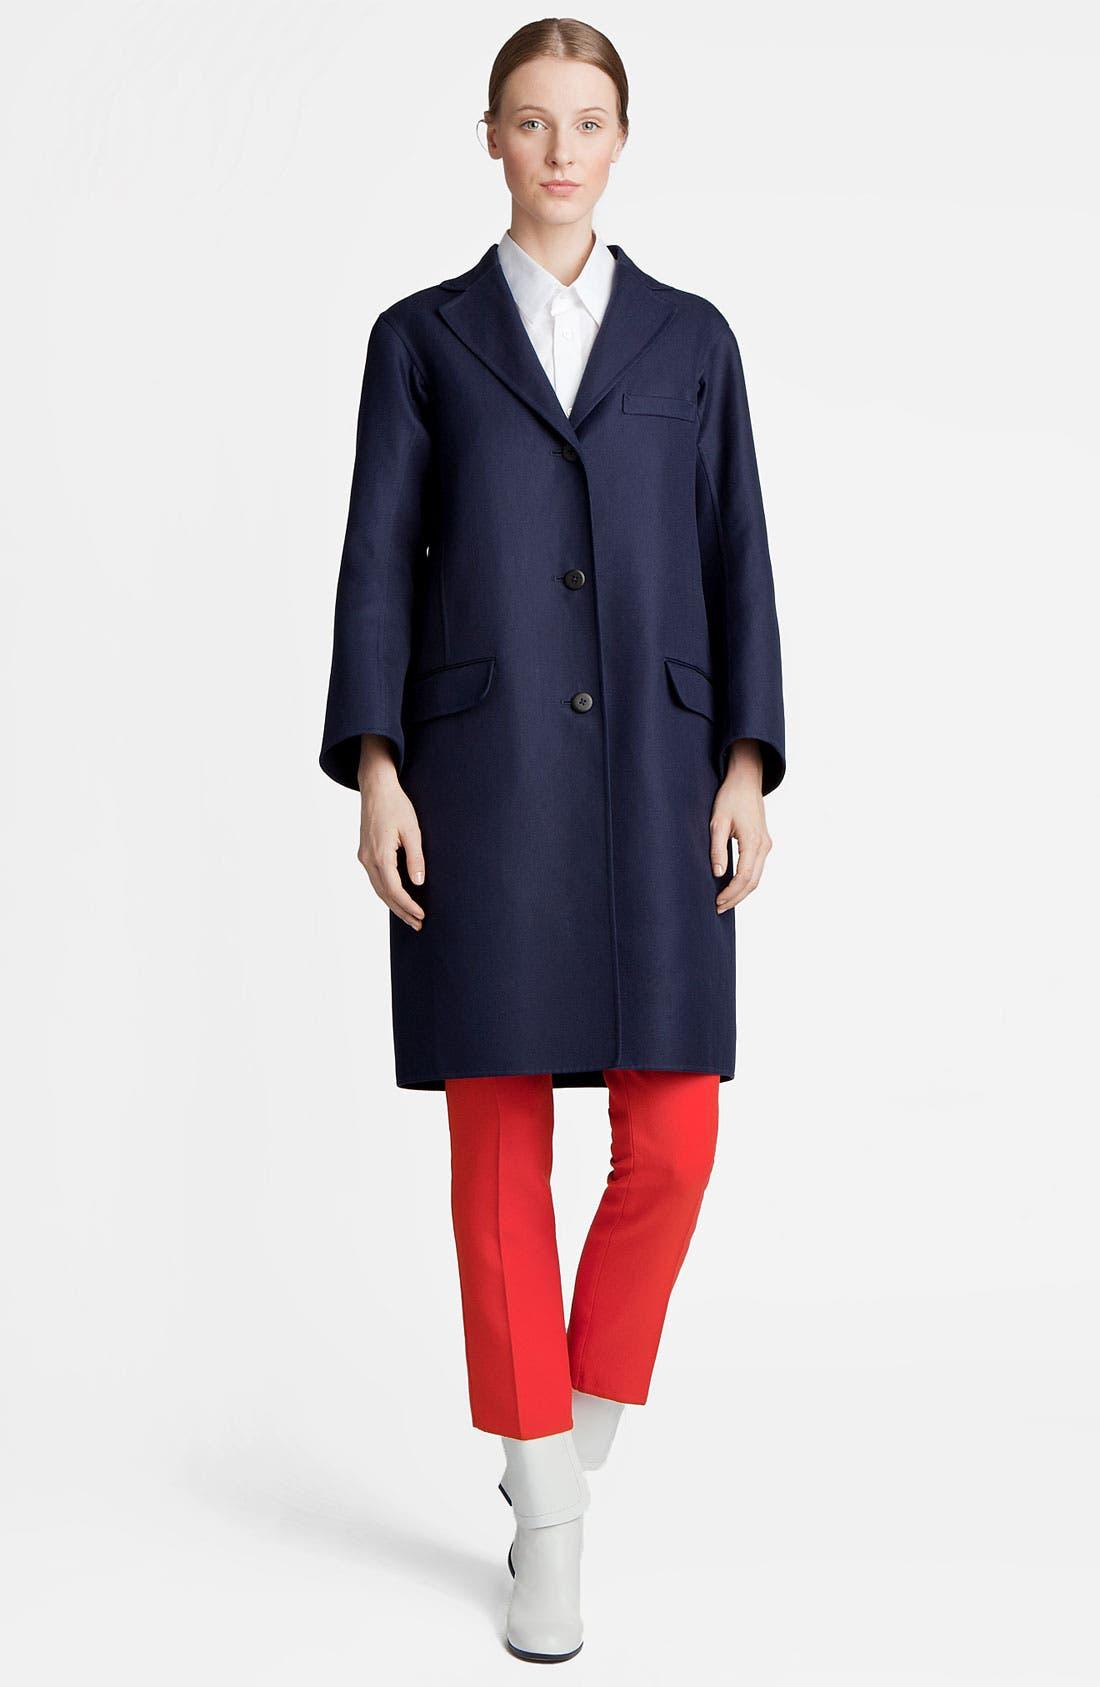 Main Image - Jil Sander Coat, Shirt & Pants